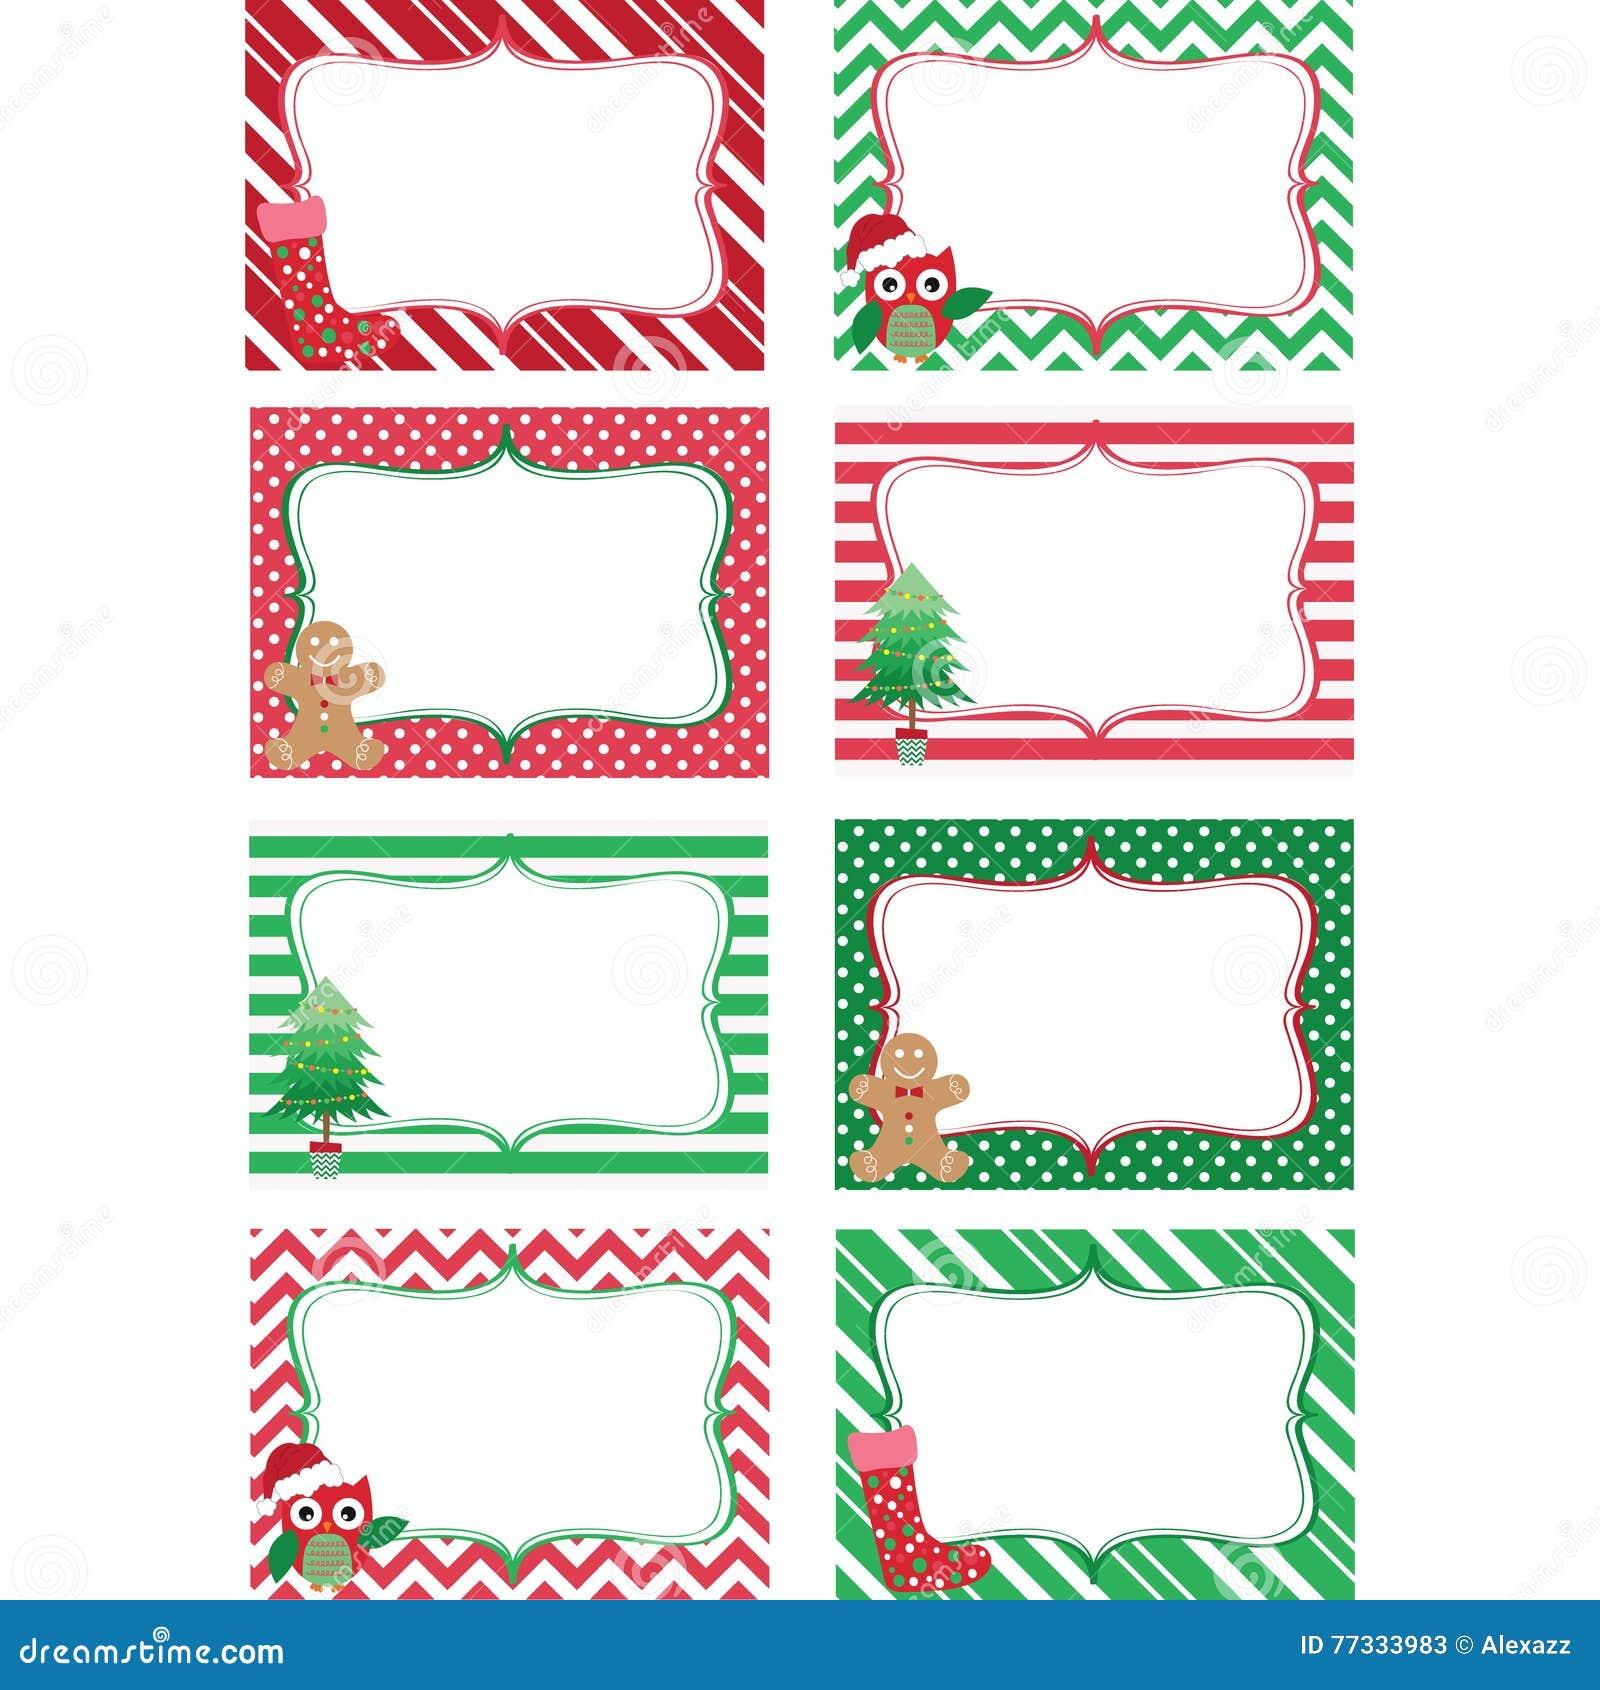 christmas printable labels set photo frame gift tags invitation